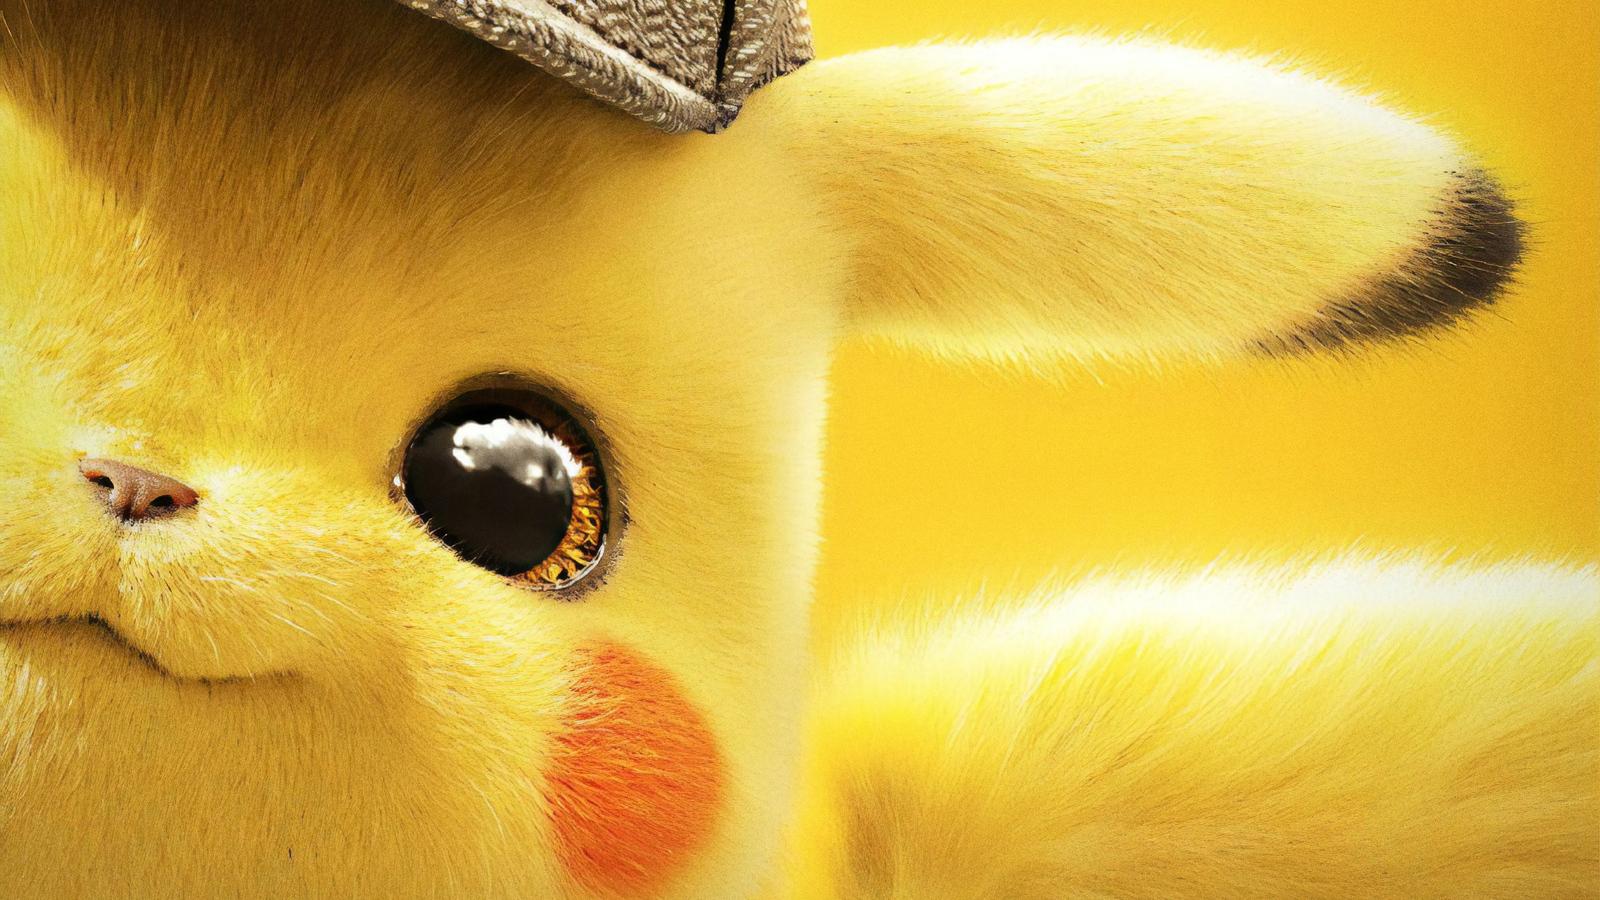 1600x900 2019 Pokemon Detective Pikachu 4k 1600x900 Resolution Hd